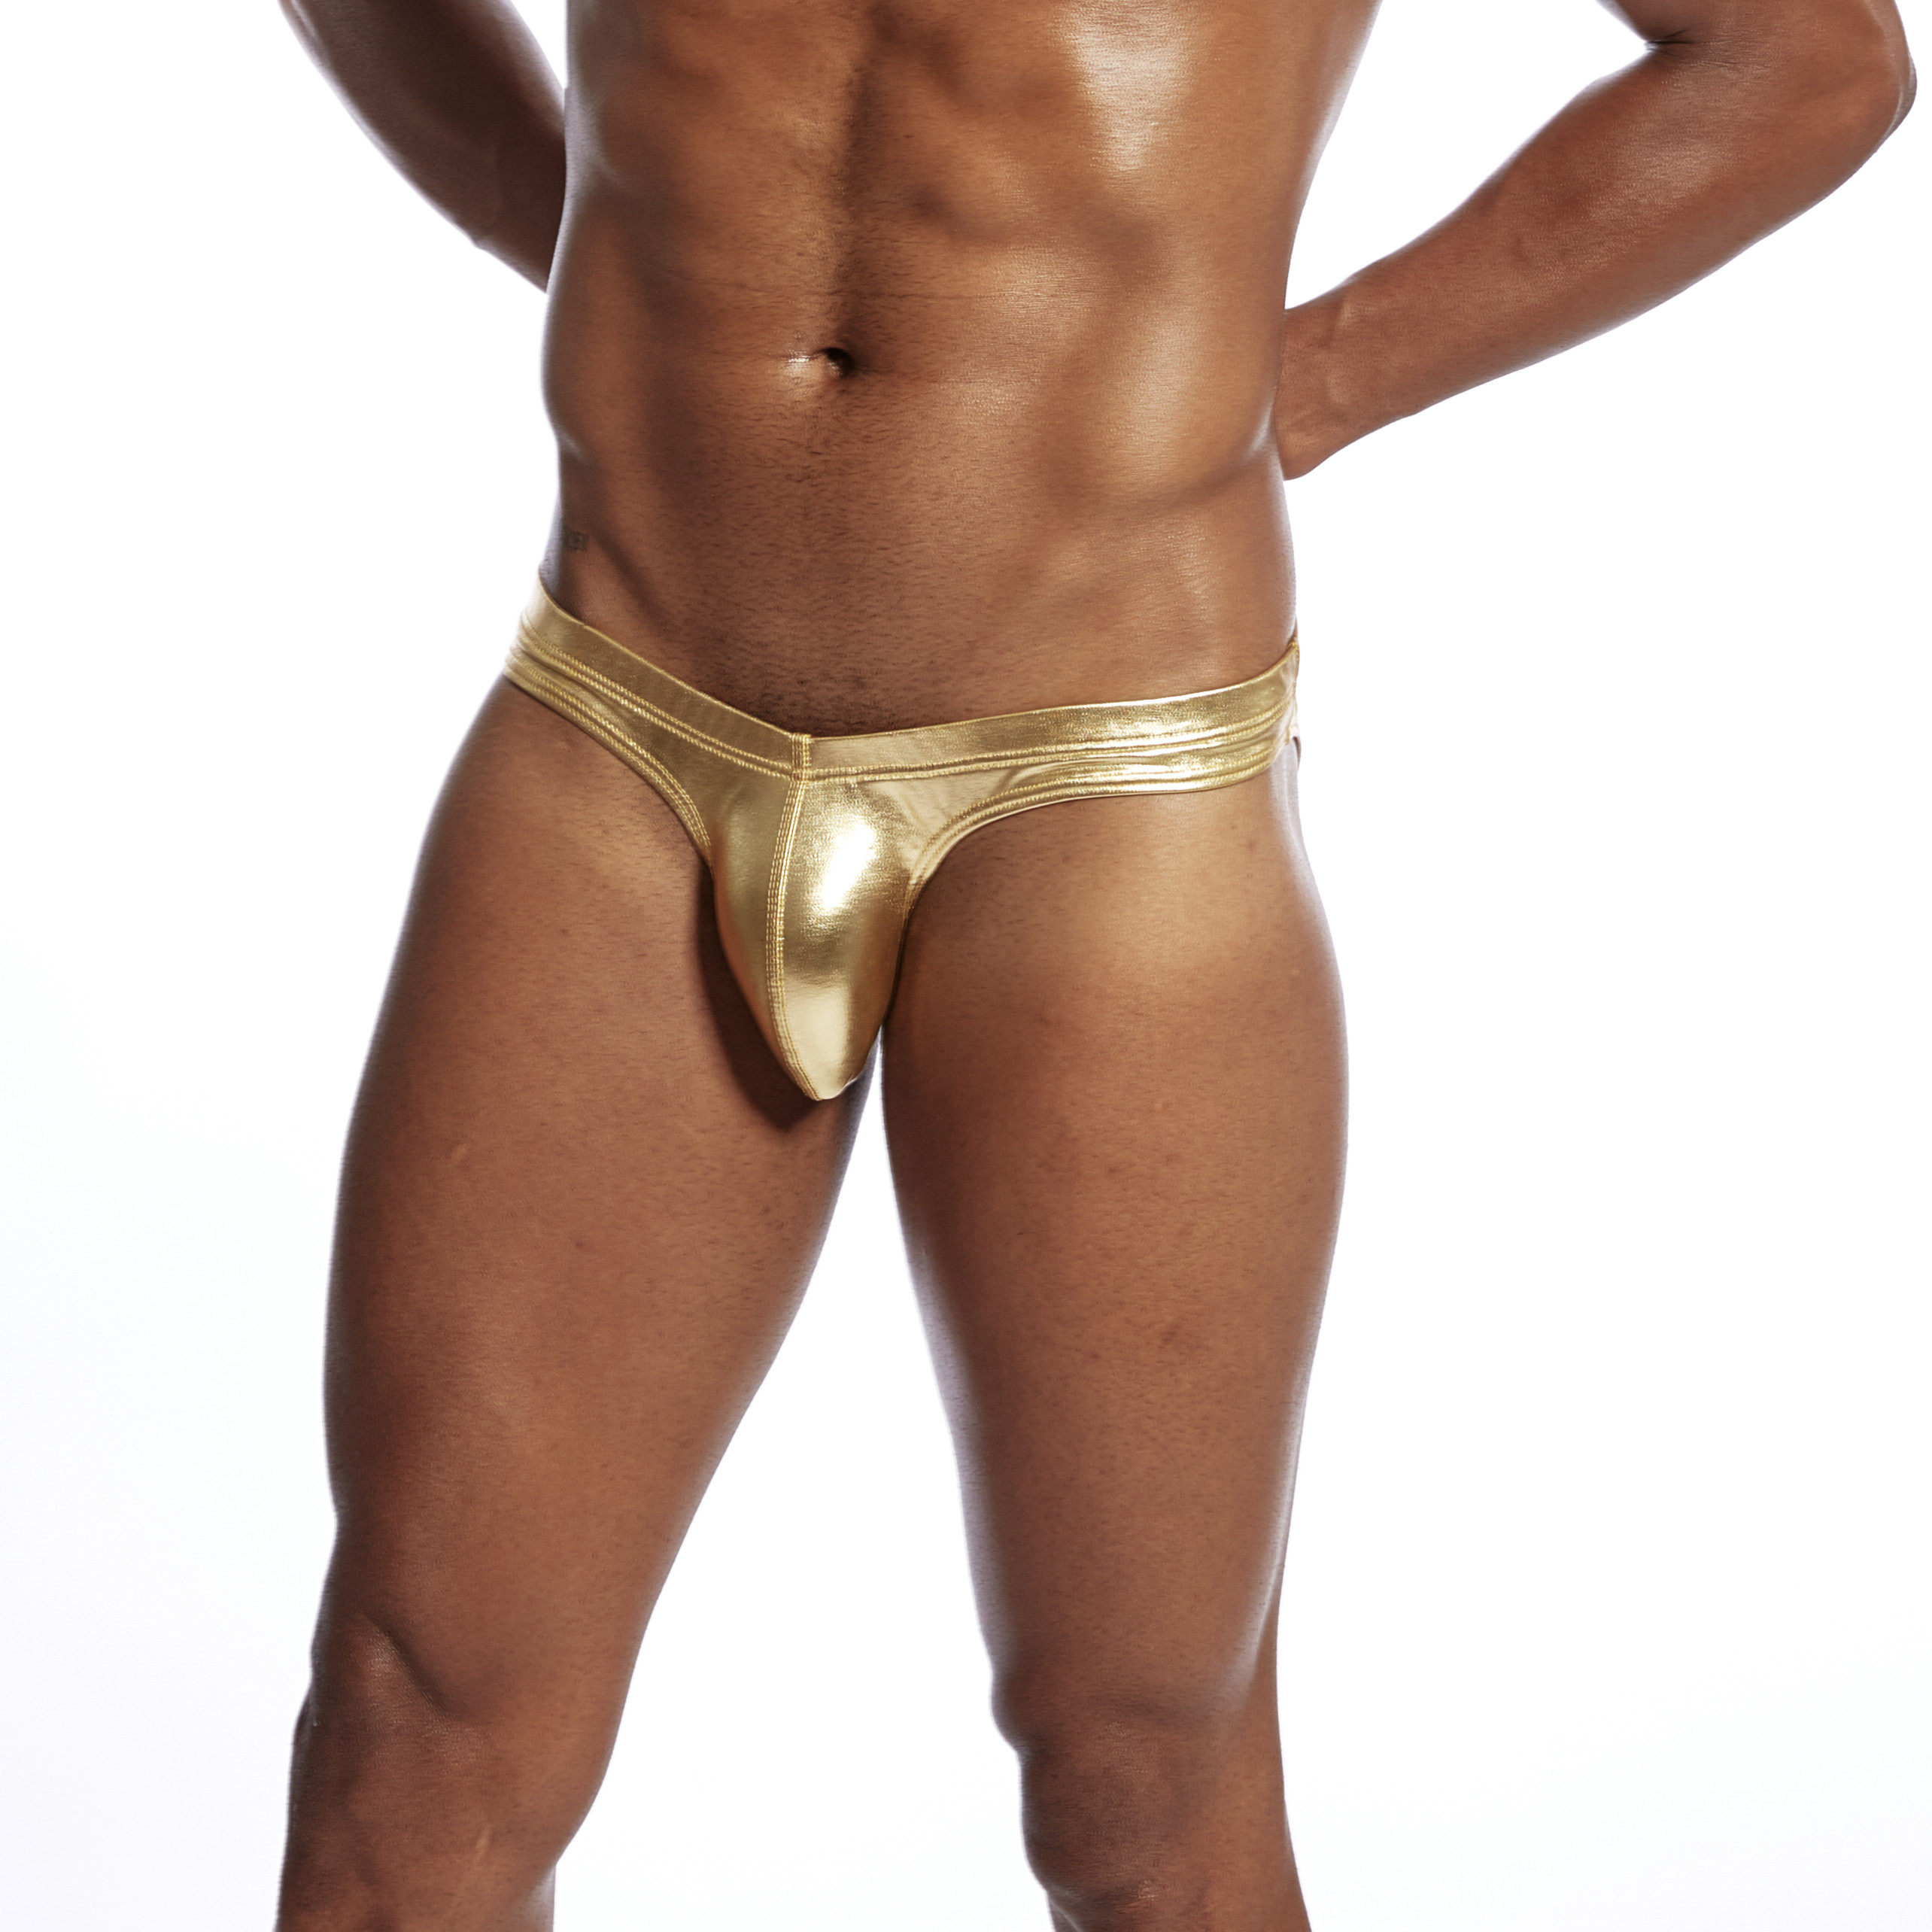 Men Underwear Sexy Mens Panties Briefs Gay Bulge Penis Exotic Jockstraps Ropa Interior Hombre Cueca Masculina Brief Panties